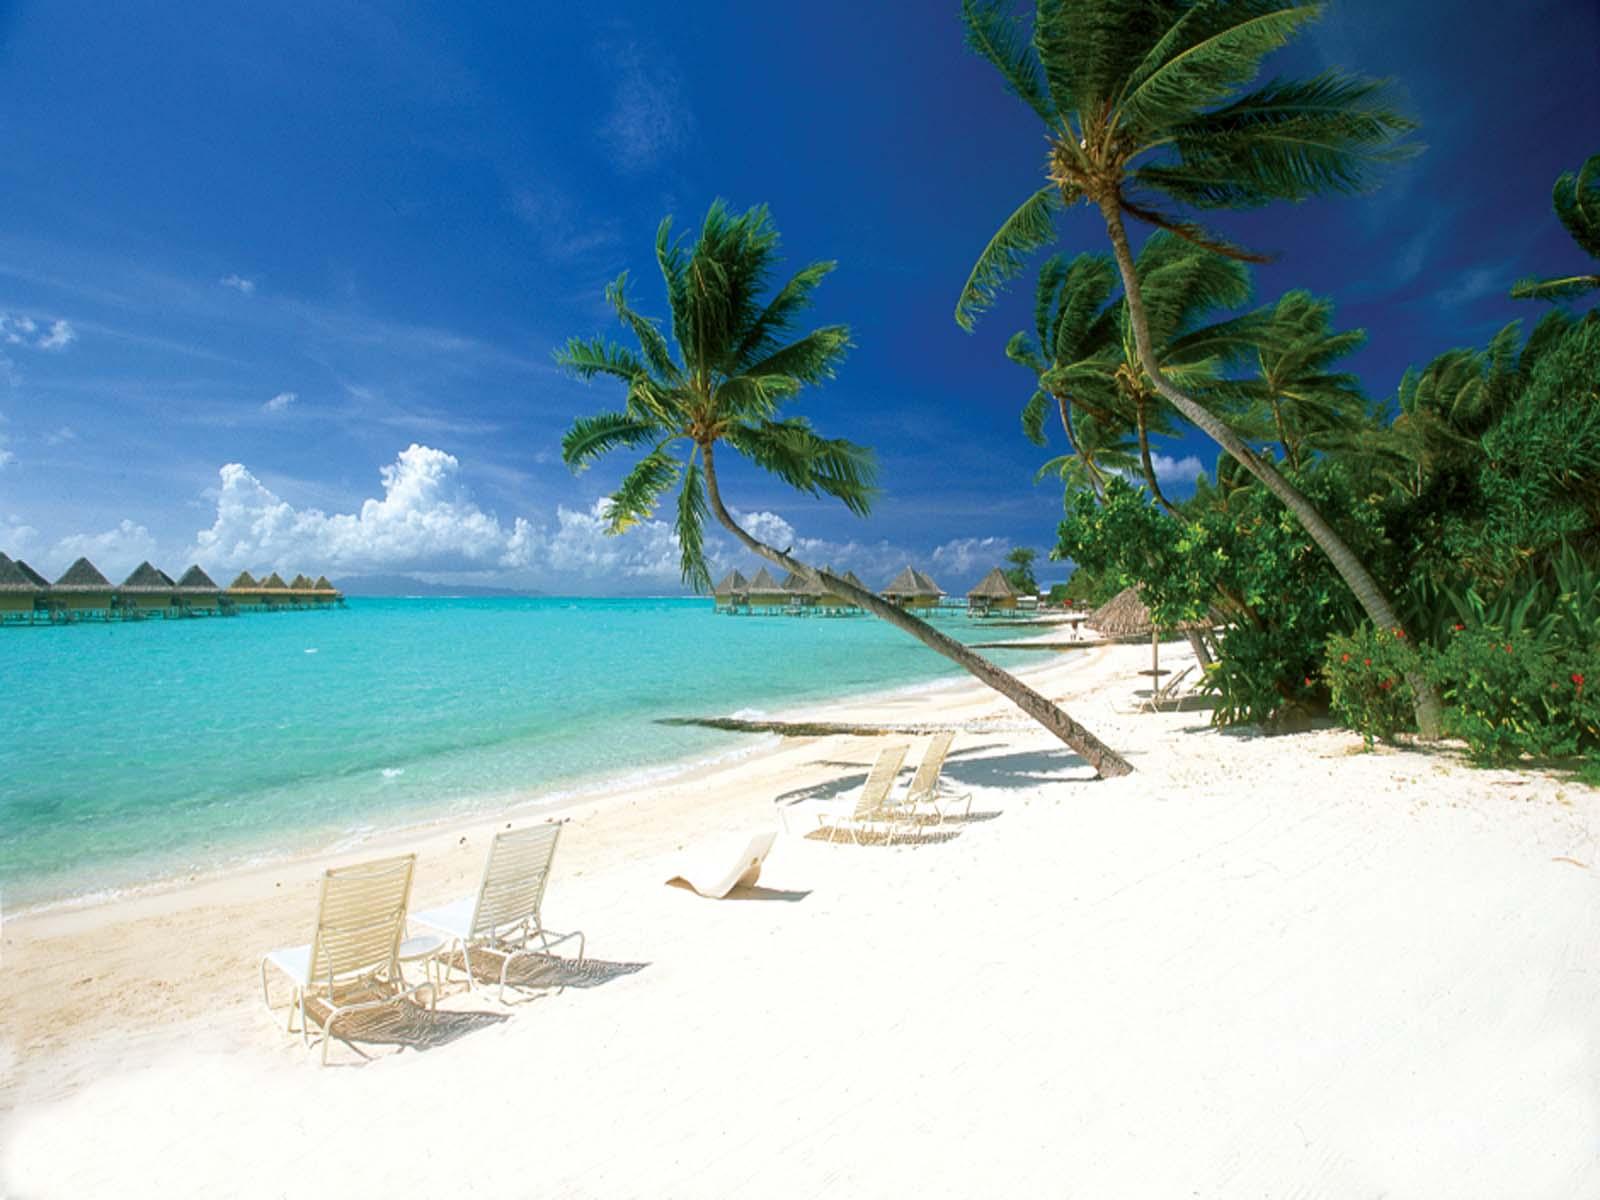 Fond ecran mer gratuit pacifique ocean indien for Fond ecran gratuit mer